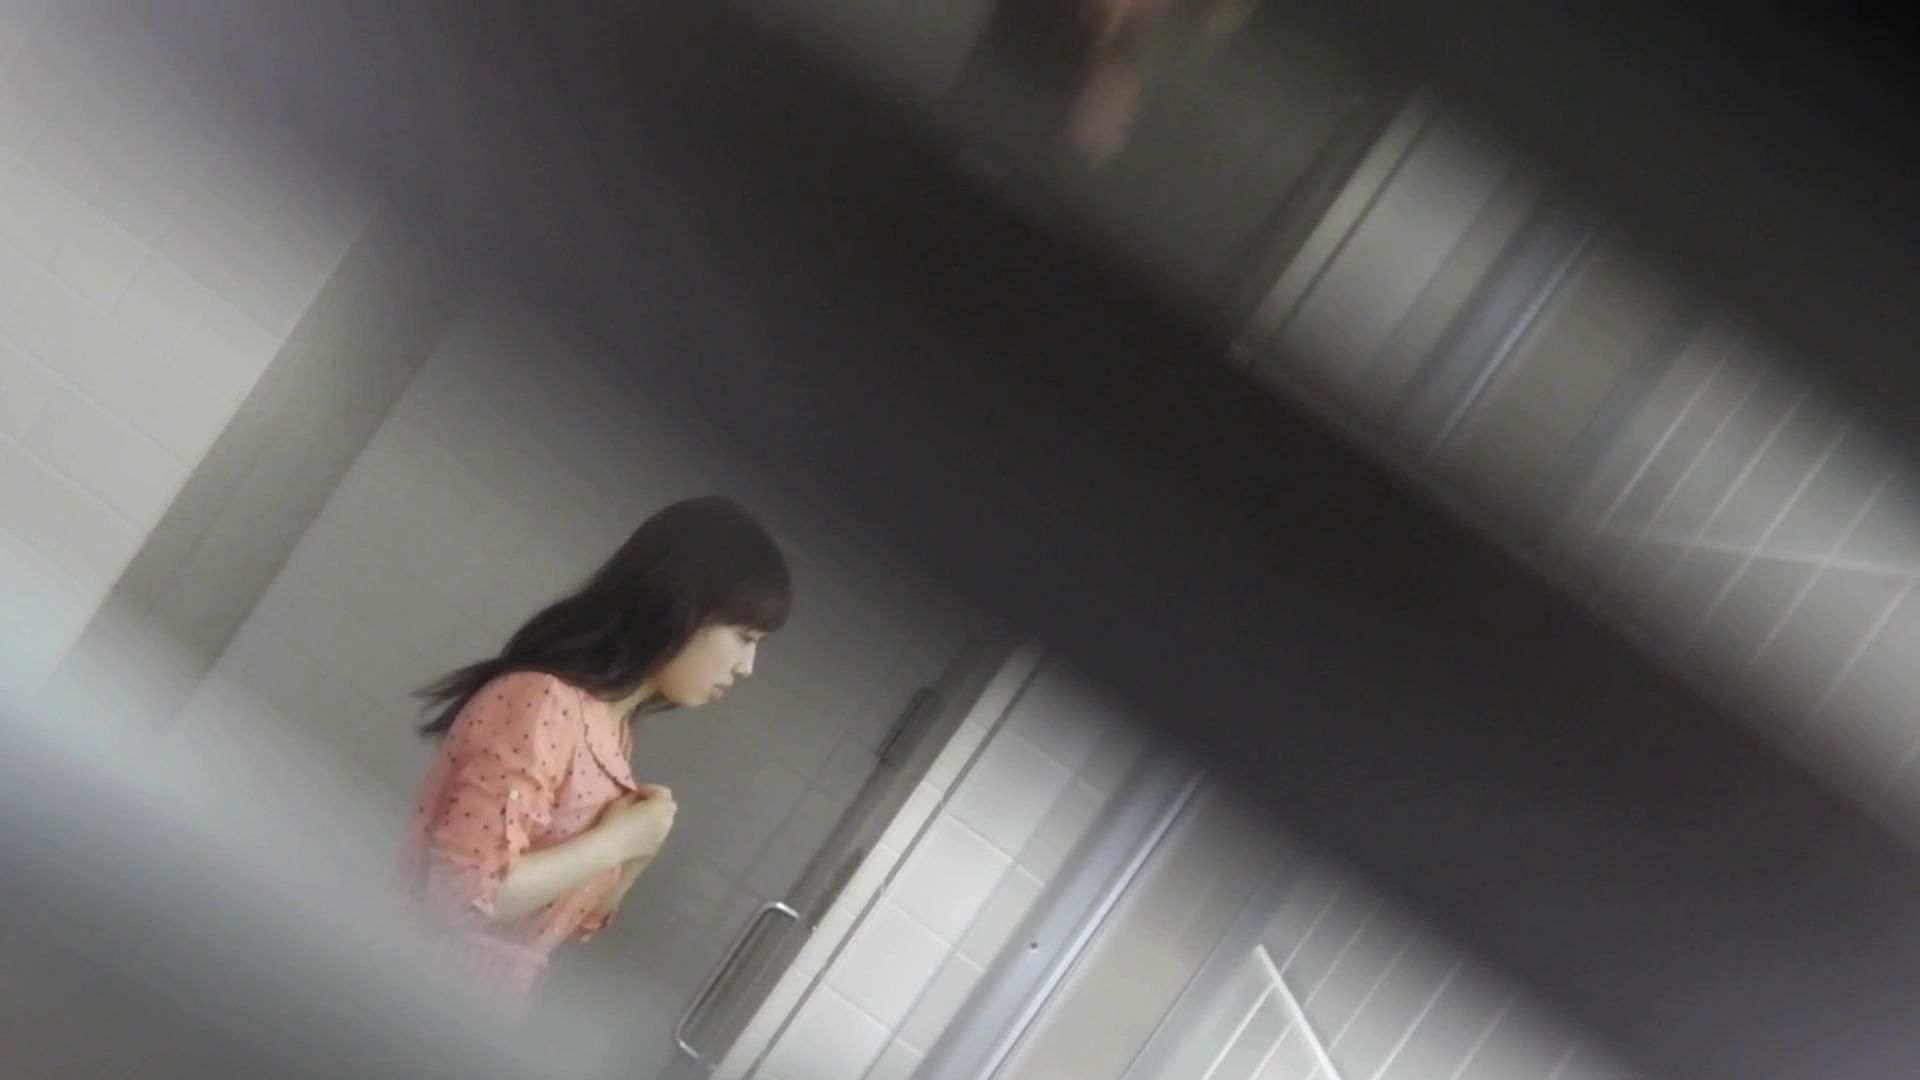 vol.27 命がけ潜伏洗面所! 小嶋陽菜似のピンクオシャレさん 美しいOLの裸体 | 洗面所突入  101pic 23